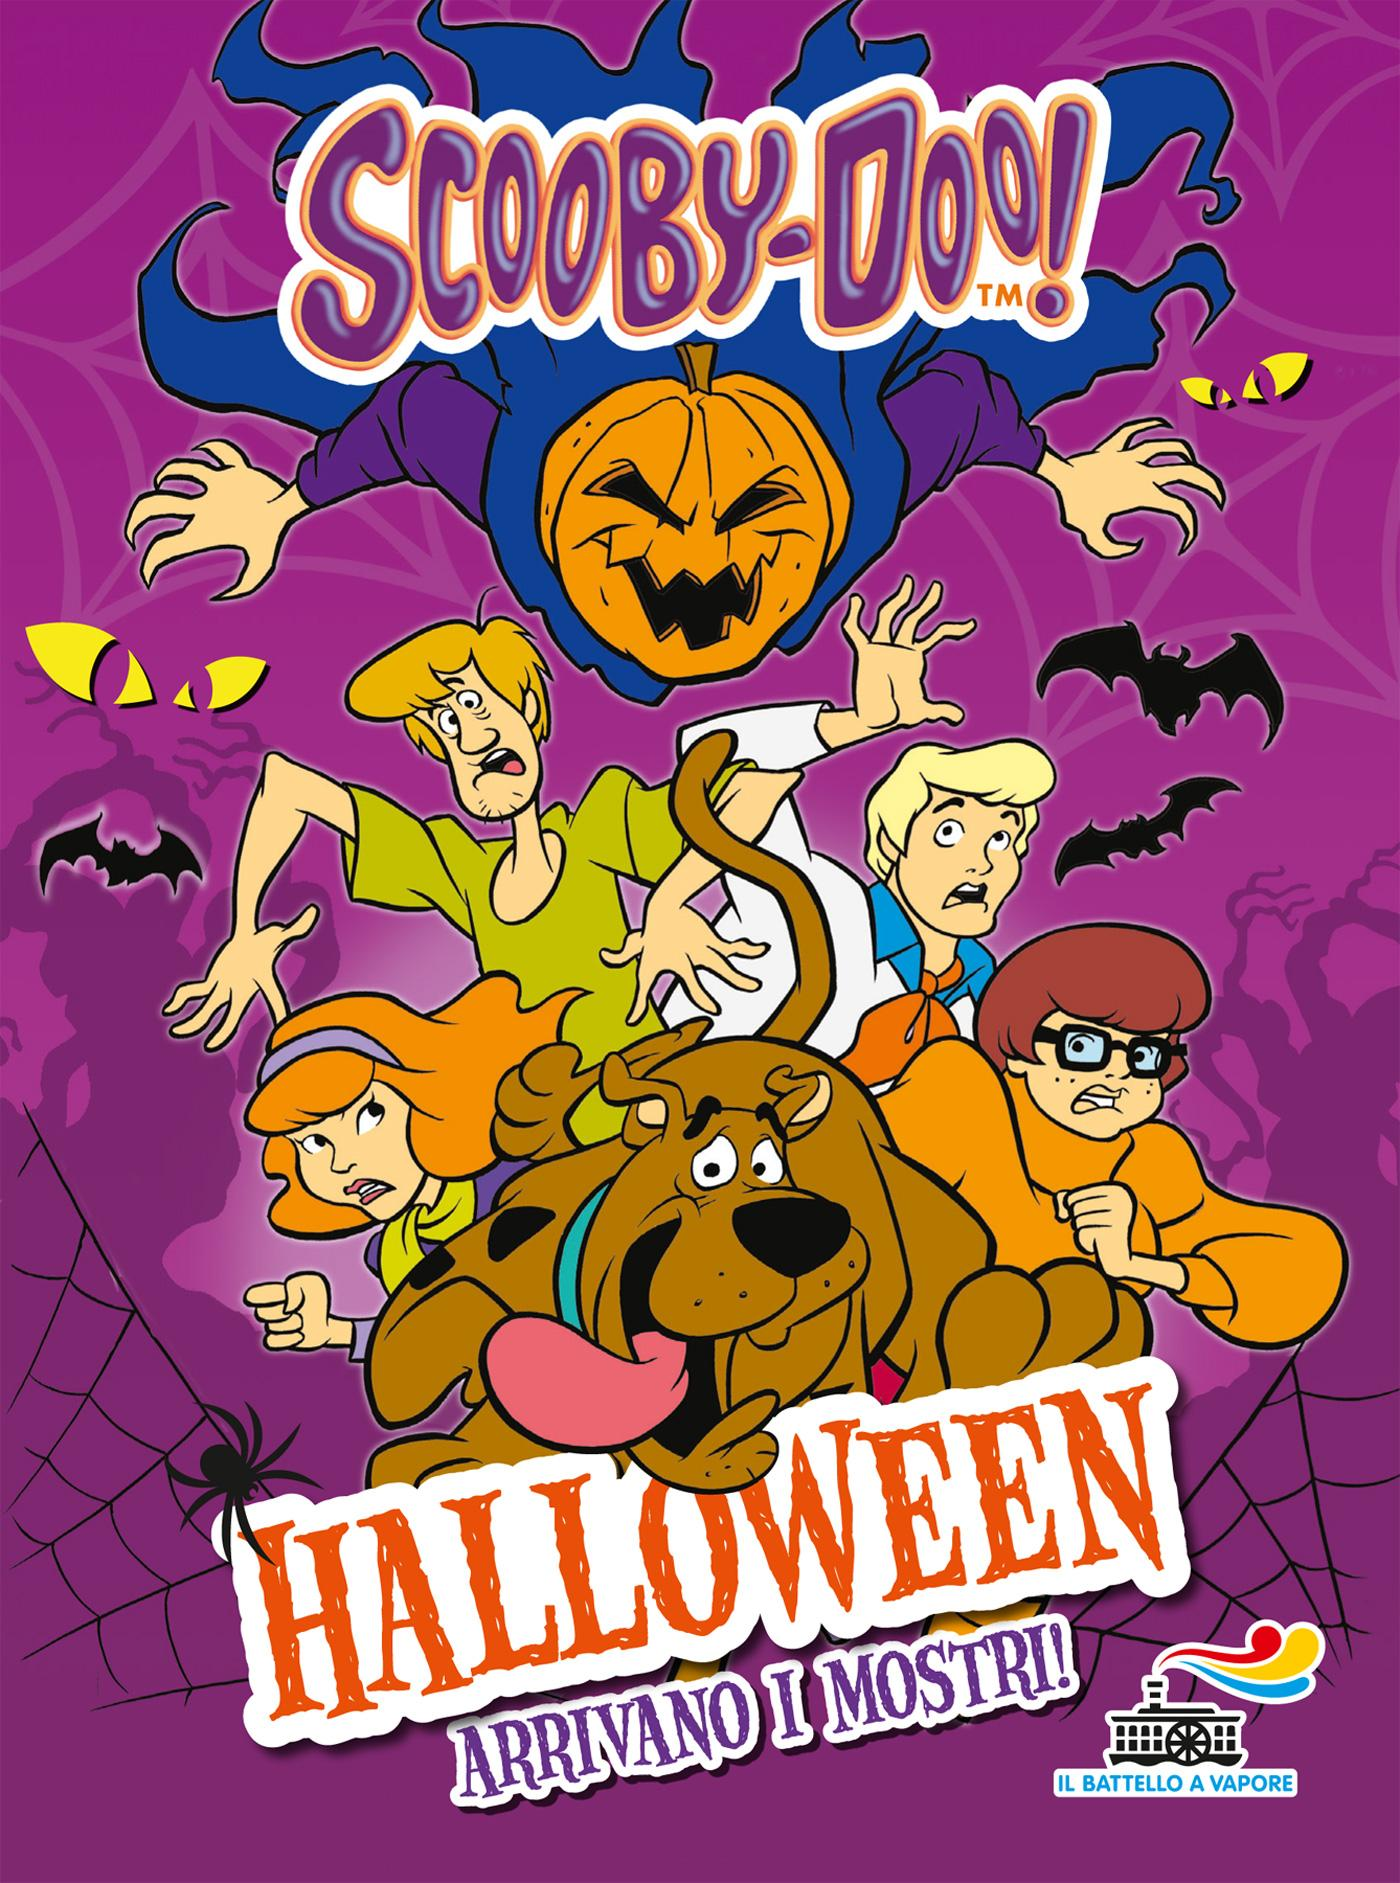 Halloween. Arrivano i mostri!